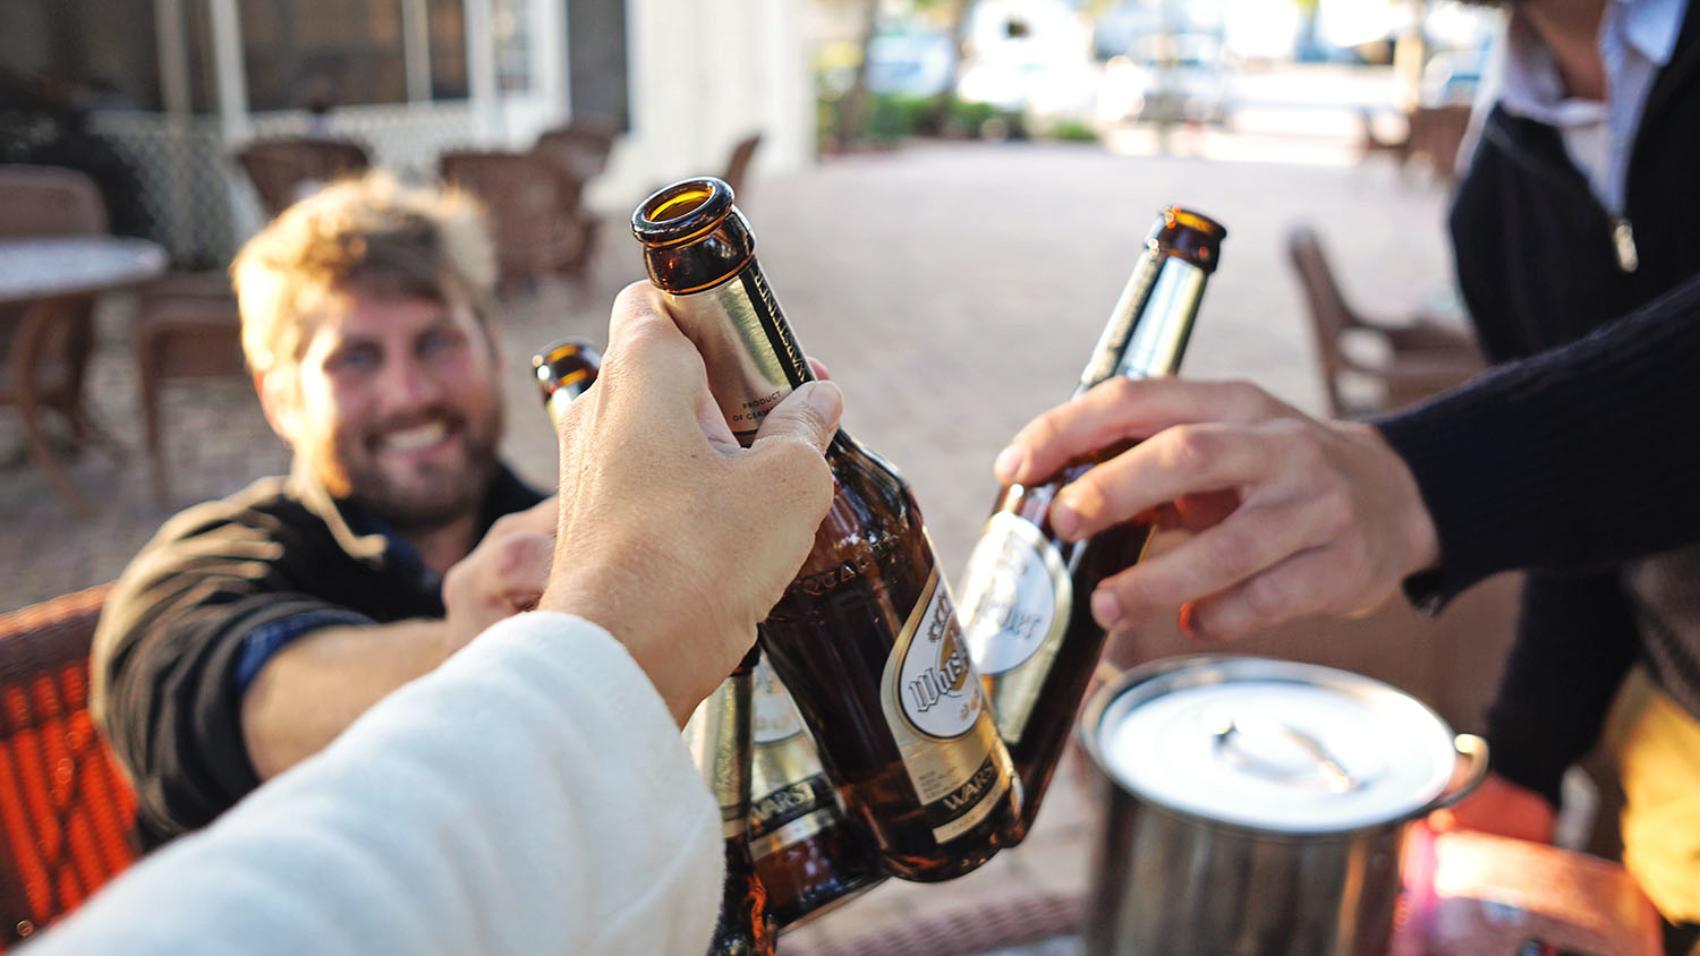 cheers with Warsteiner